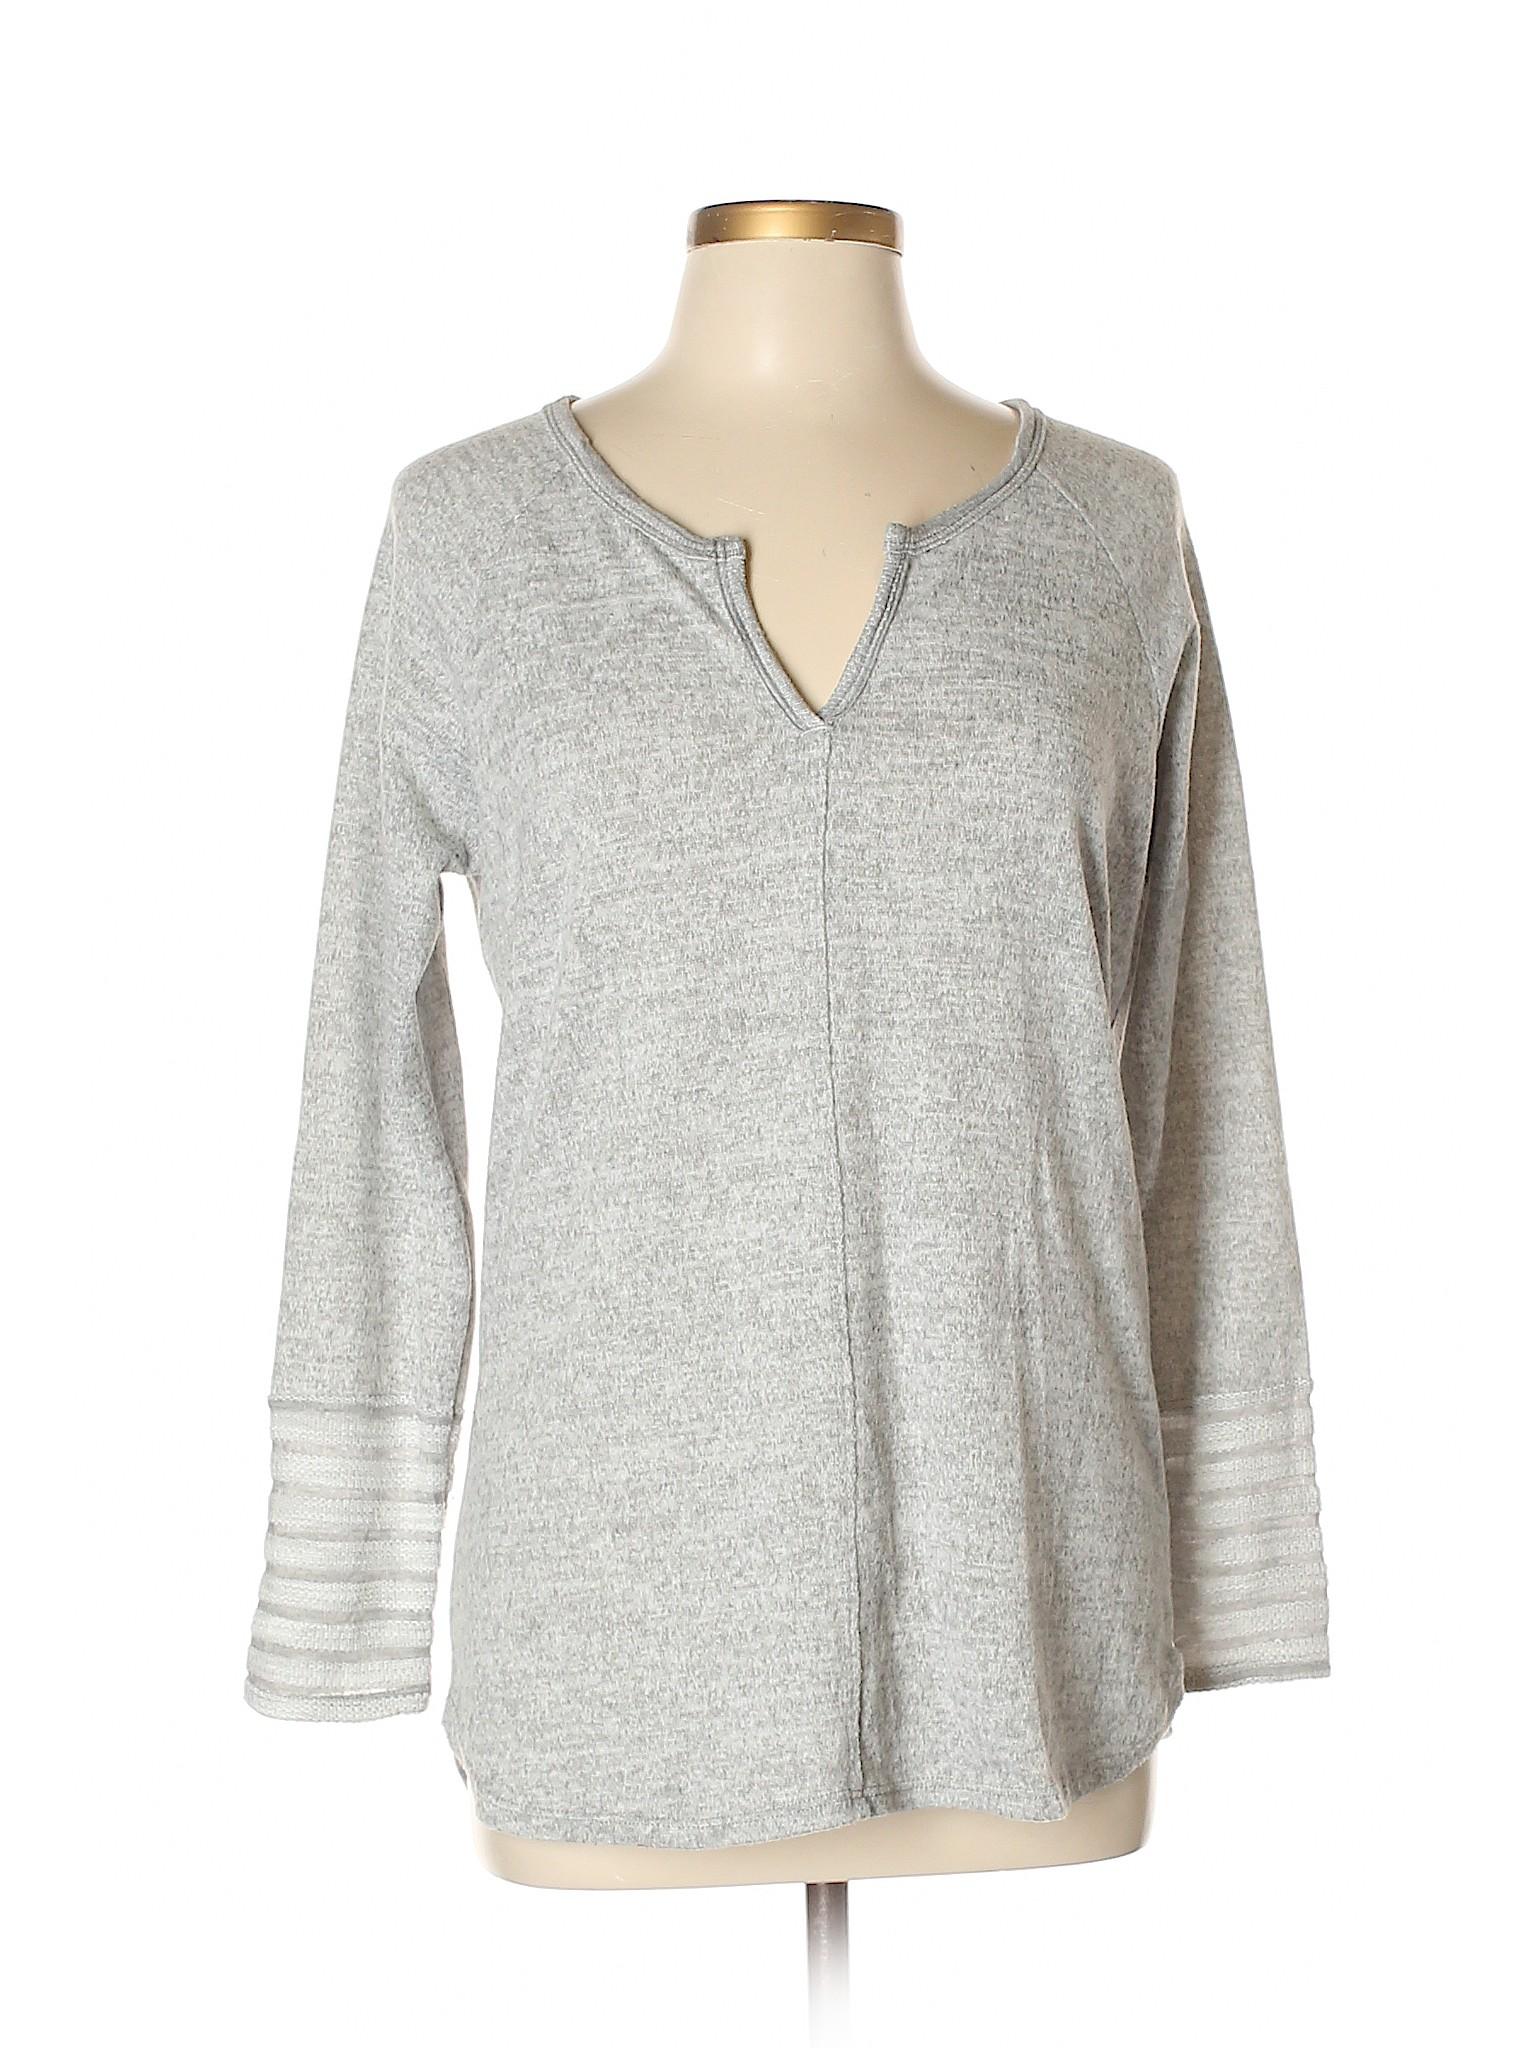 winter Pullover Sweater winter Loveappella Loveappella Boutique Pullover winter Pullover Loveappella Sweater Boutique Boutique pBn0gw